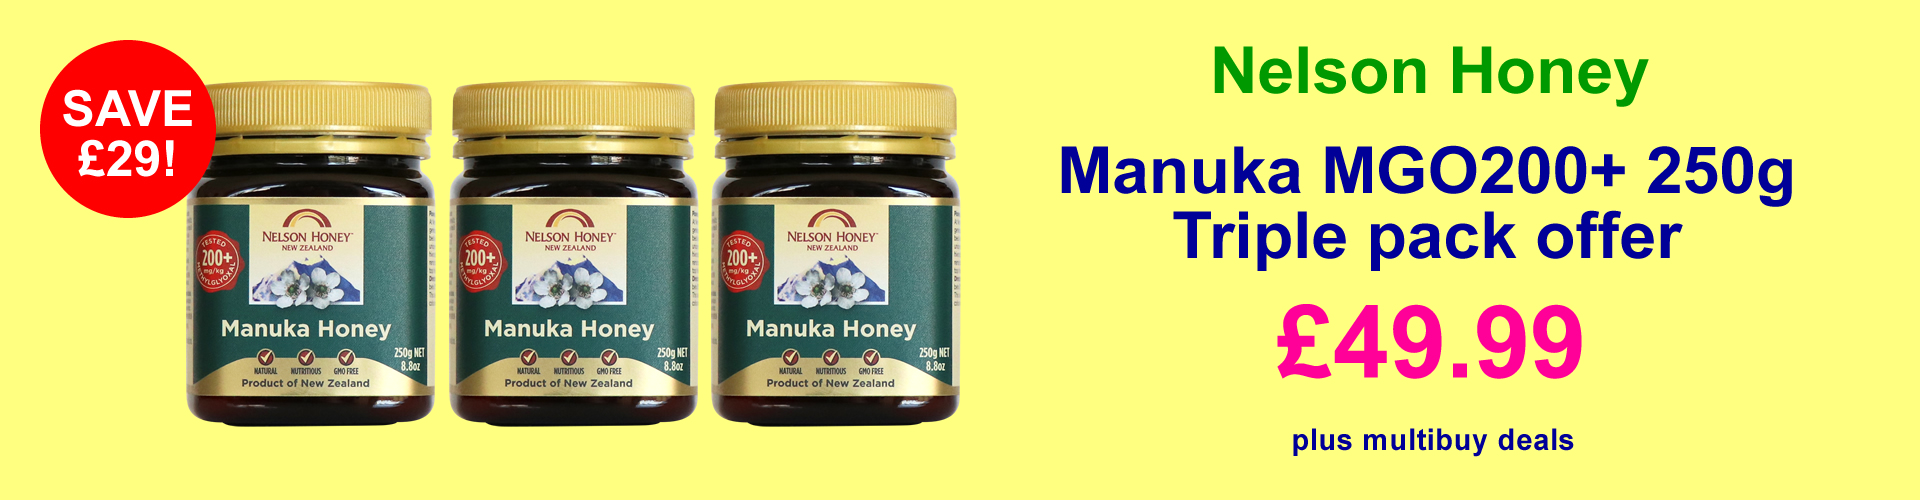 Special triple pack Nelson Honey Manuka Honey MGO200+ 250g only £49.99